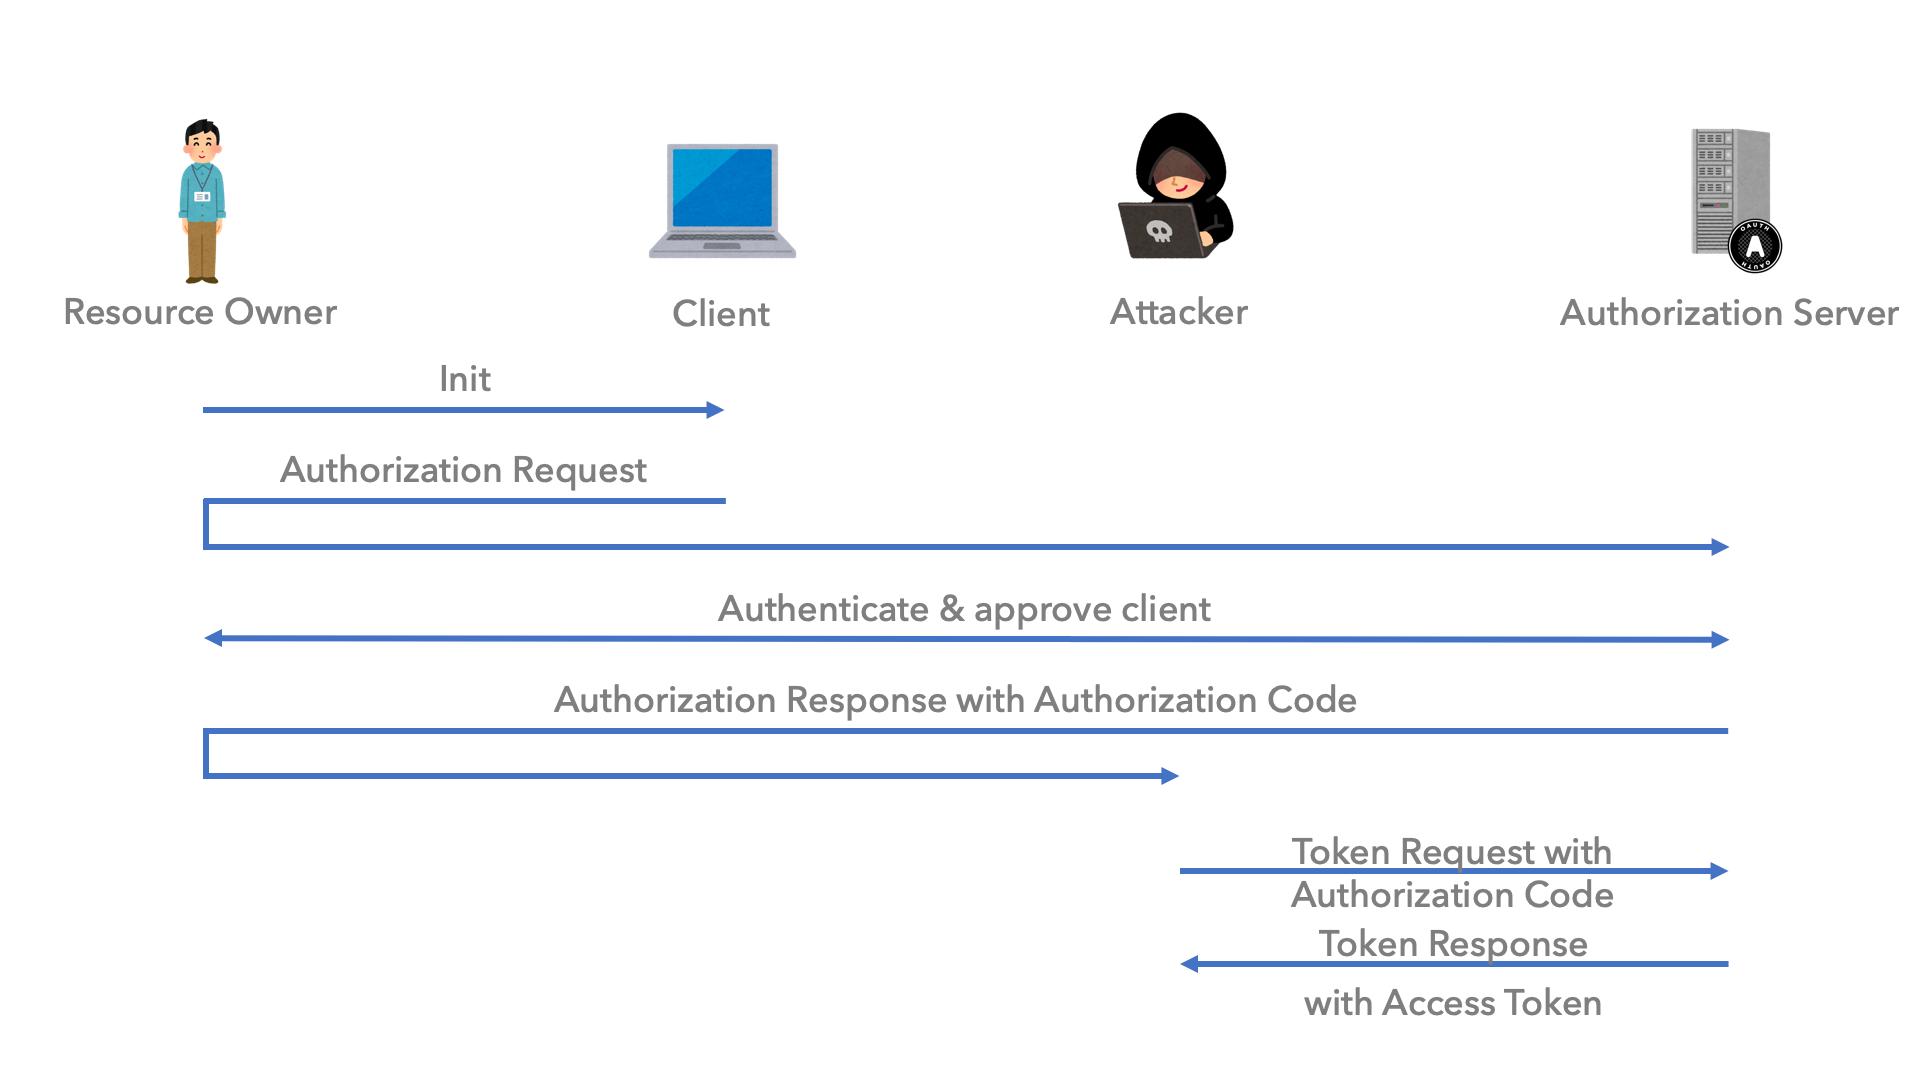 Authorization Code Interception Attack のシーケンス図